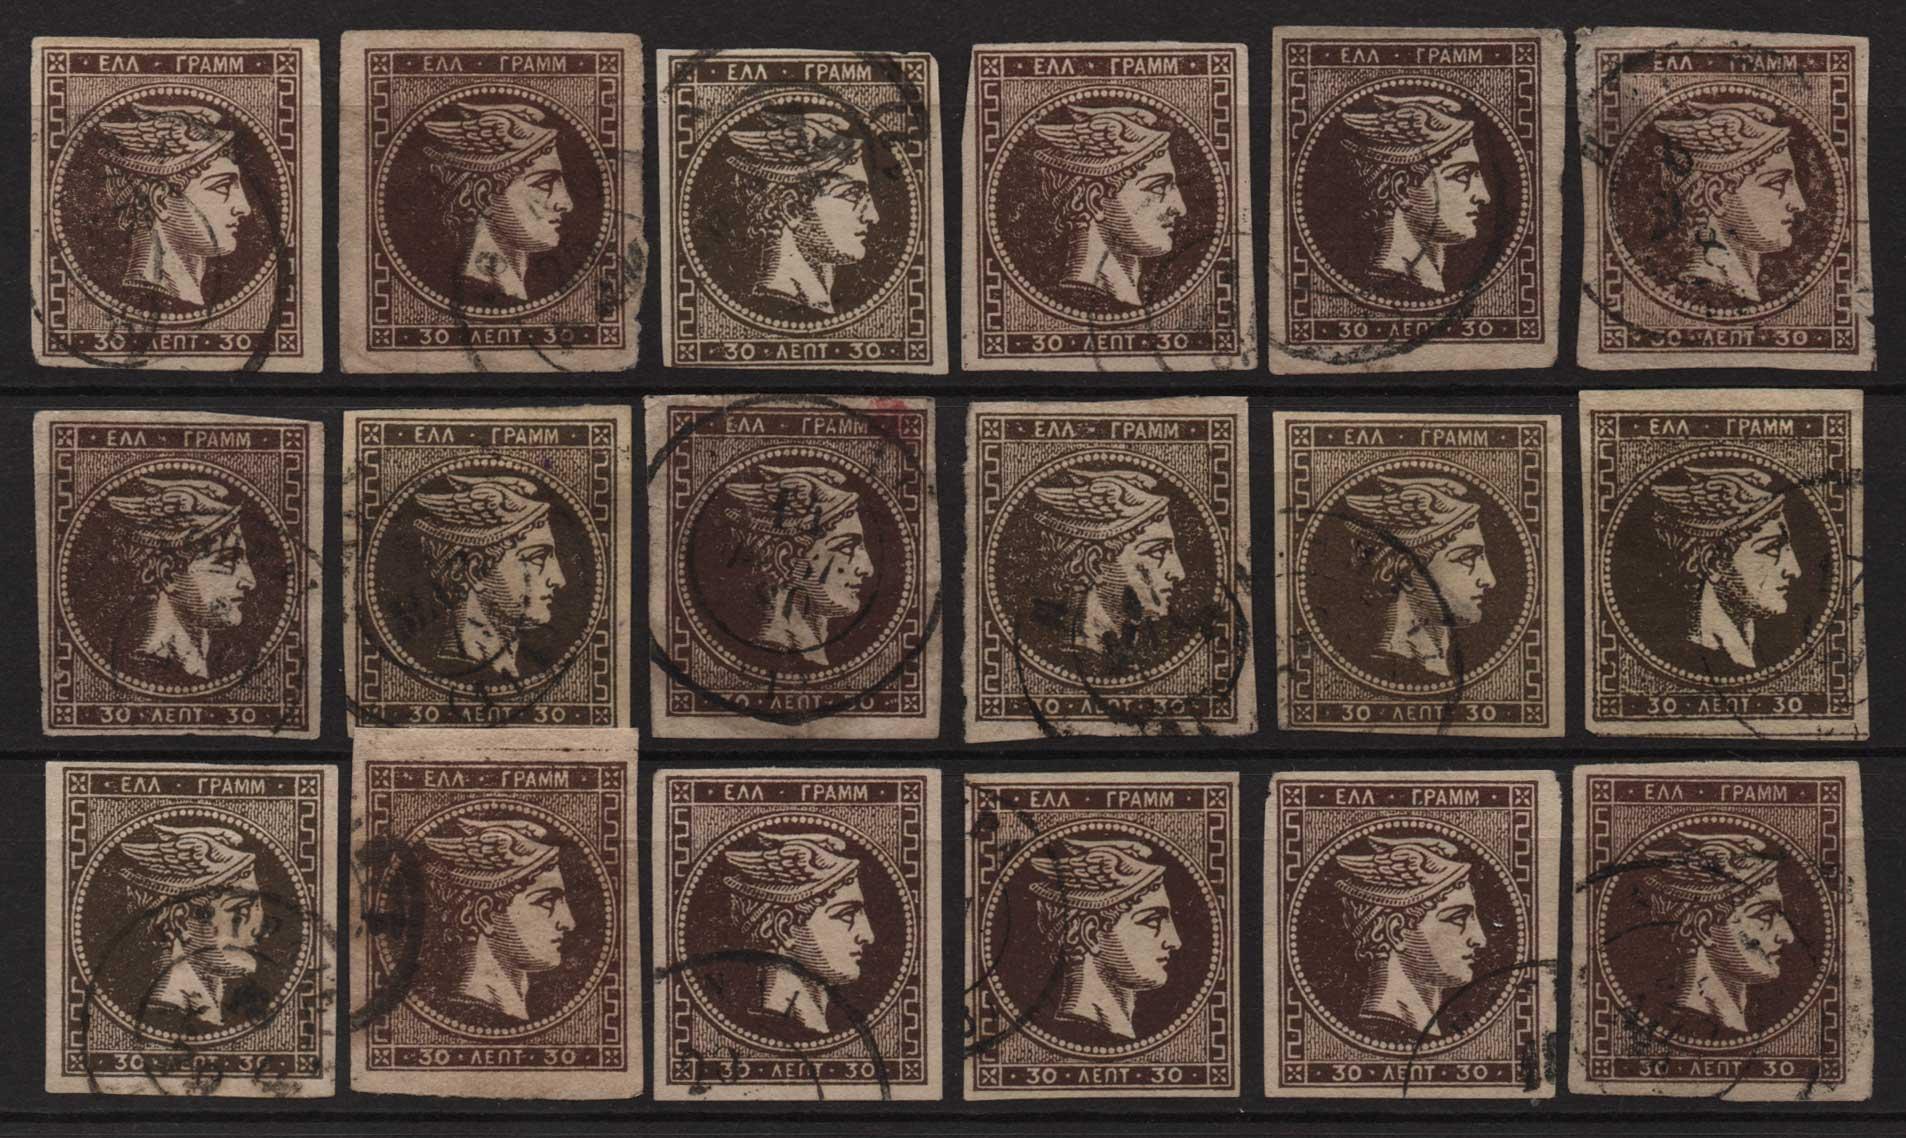 Lot 6 - -  LARGE HERMES HEAD large hermes head -  Athens Auctions Public Auction 67 General Stamp Sale